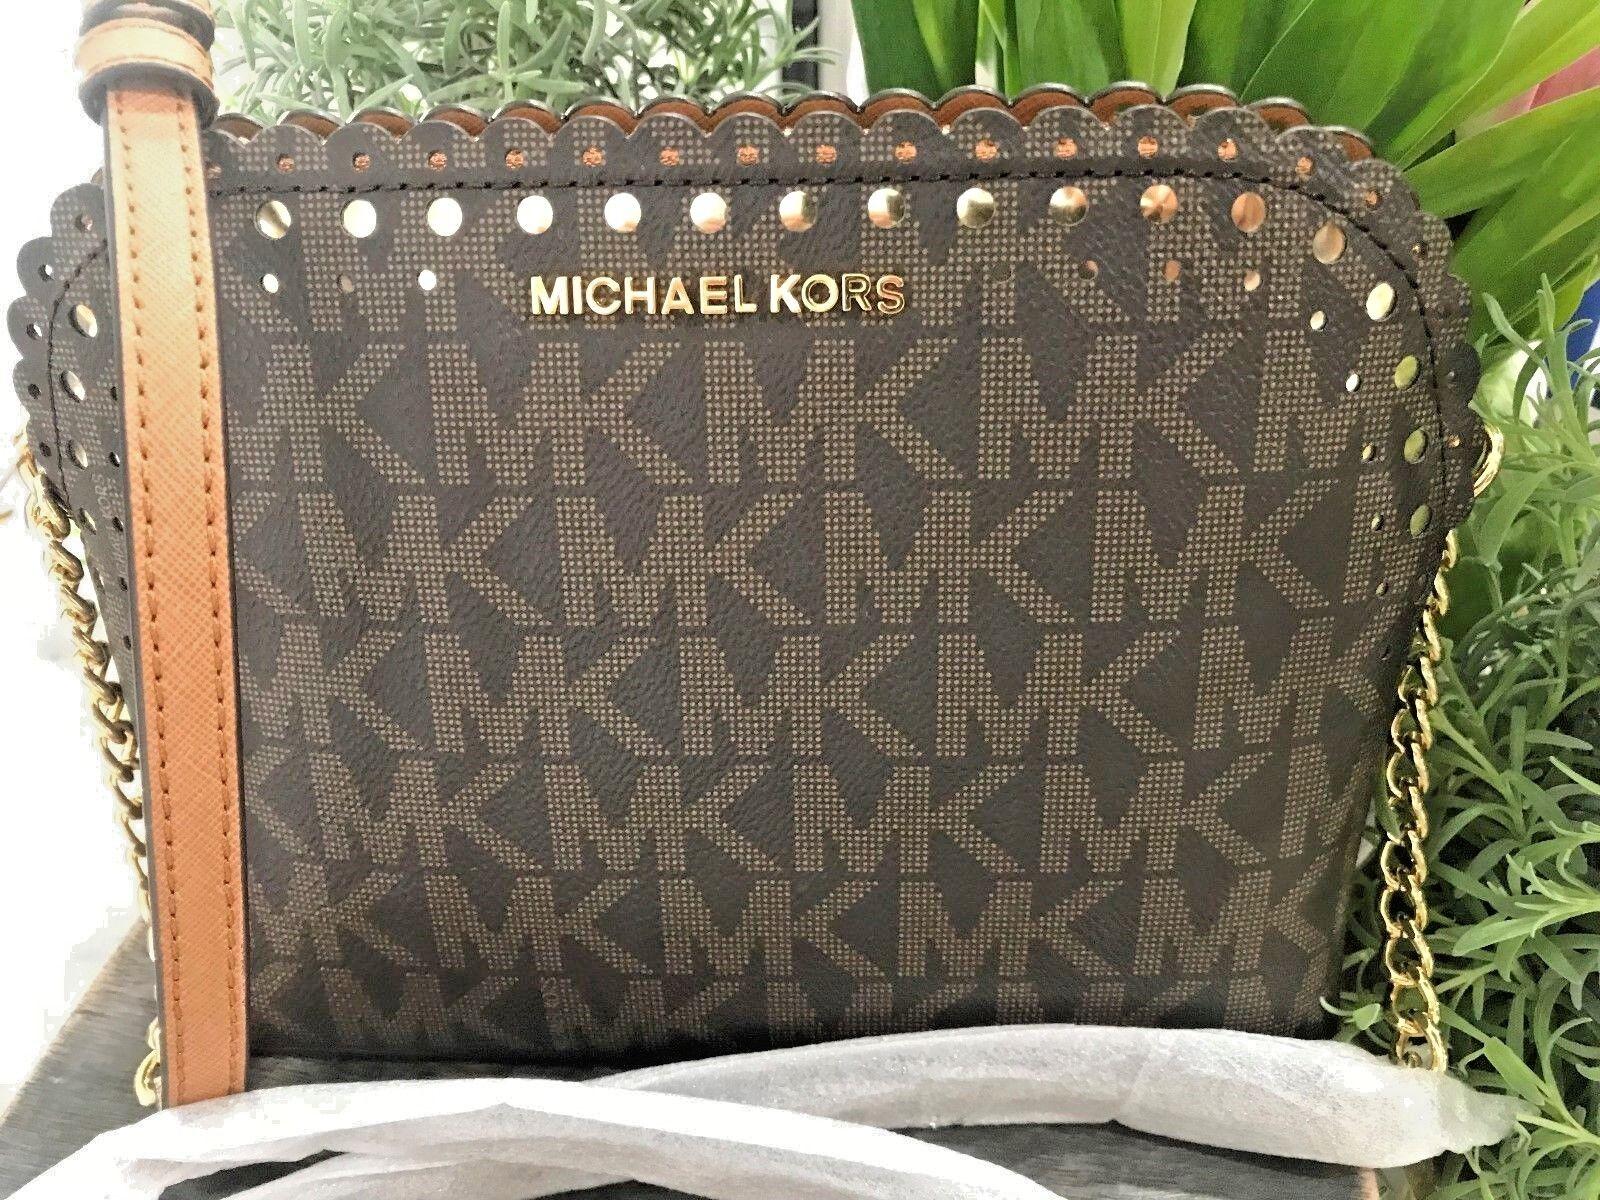 Michael Kors - MICHAEL KORS VIOLET CINDY DOME CROSSBODY BAG IN BROWN SIGNATURE & ACORN SAFFIANO